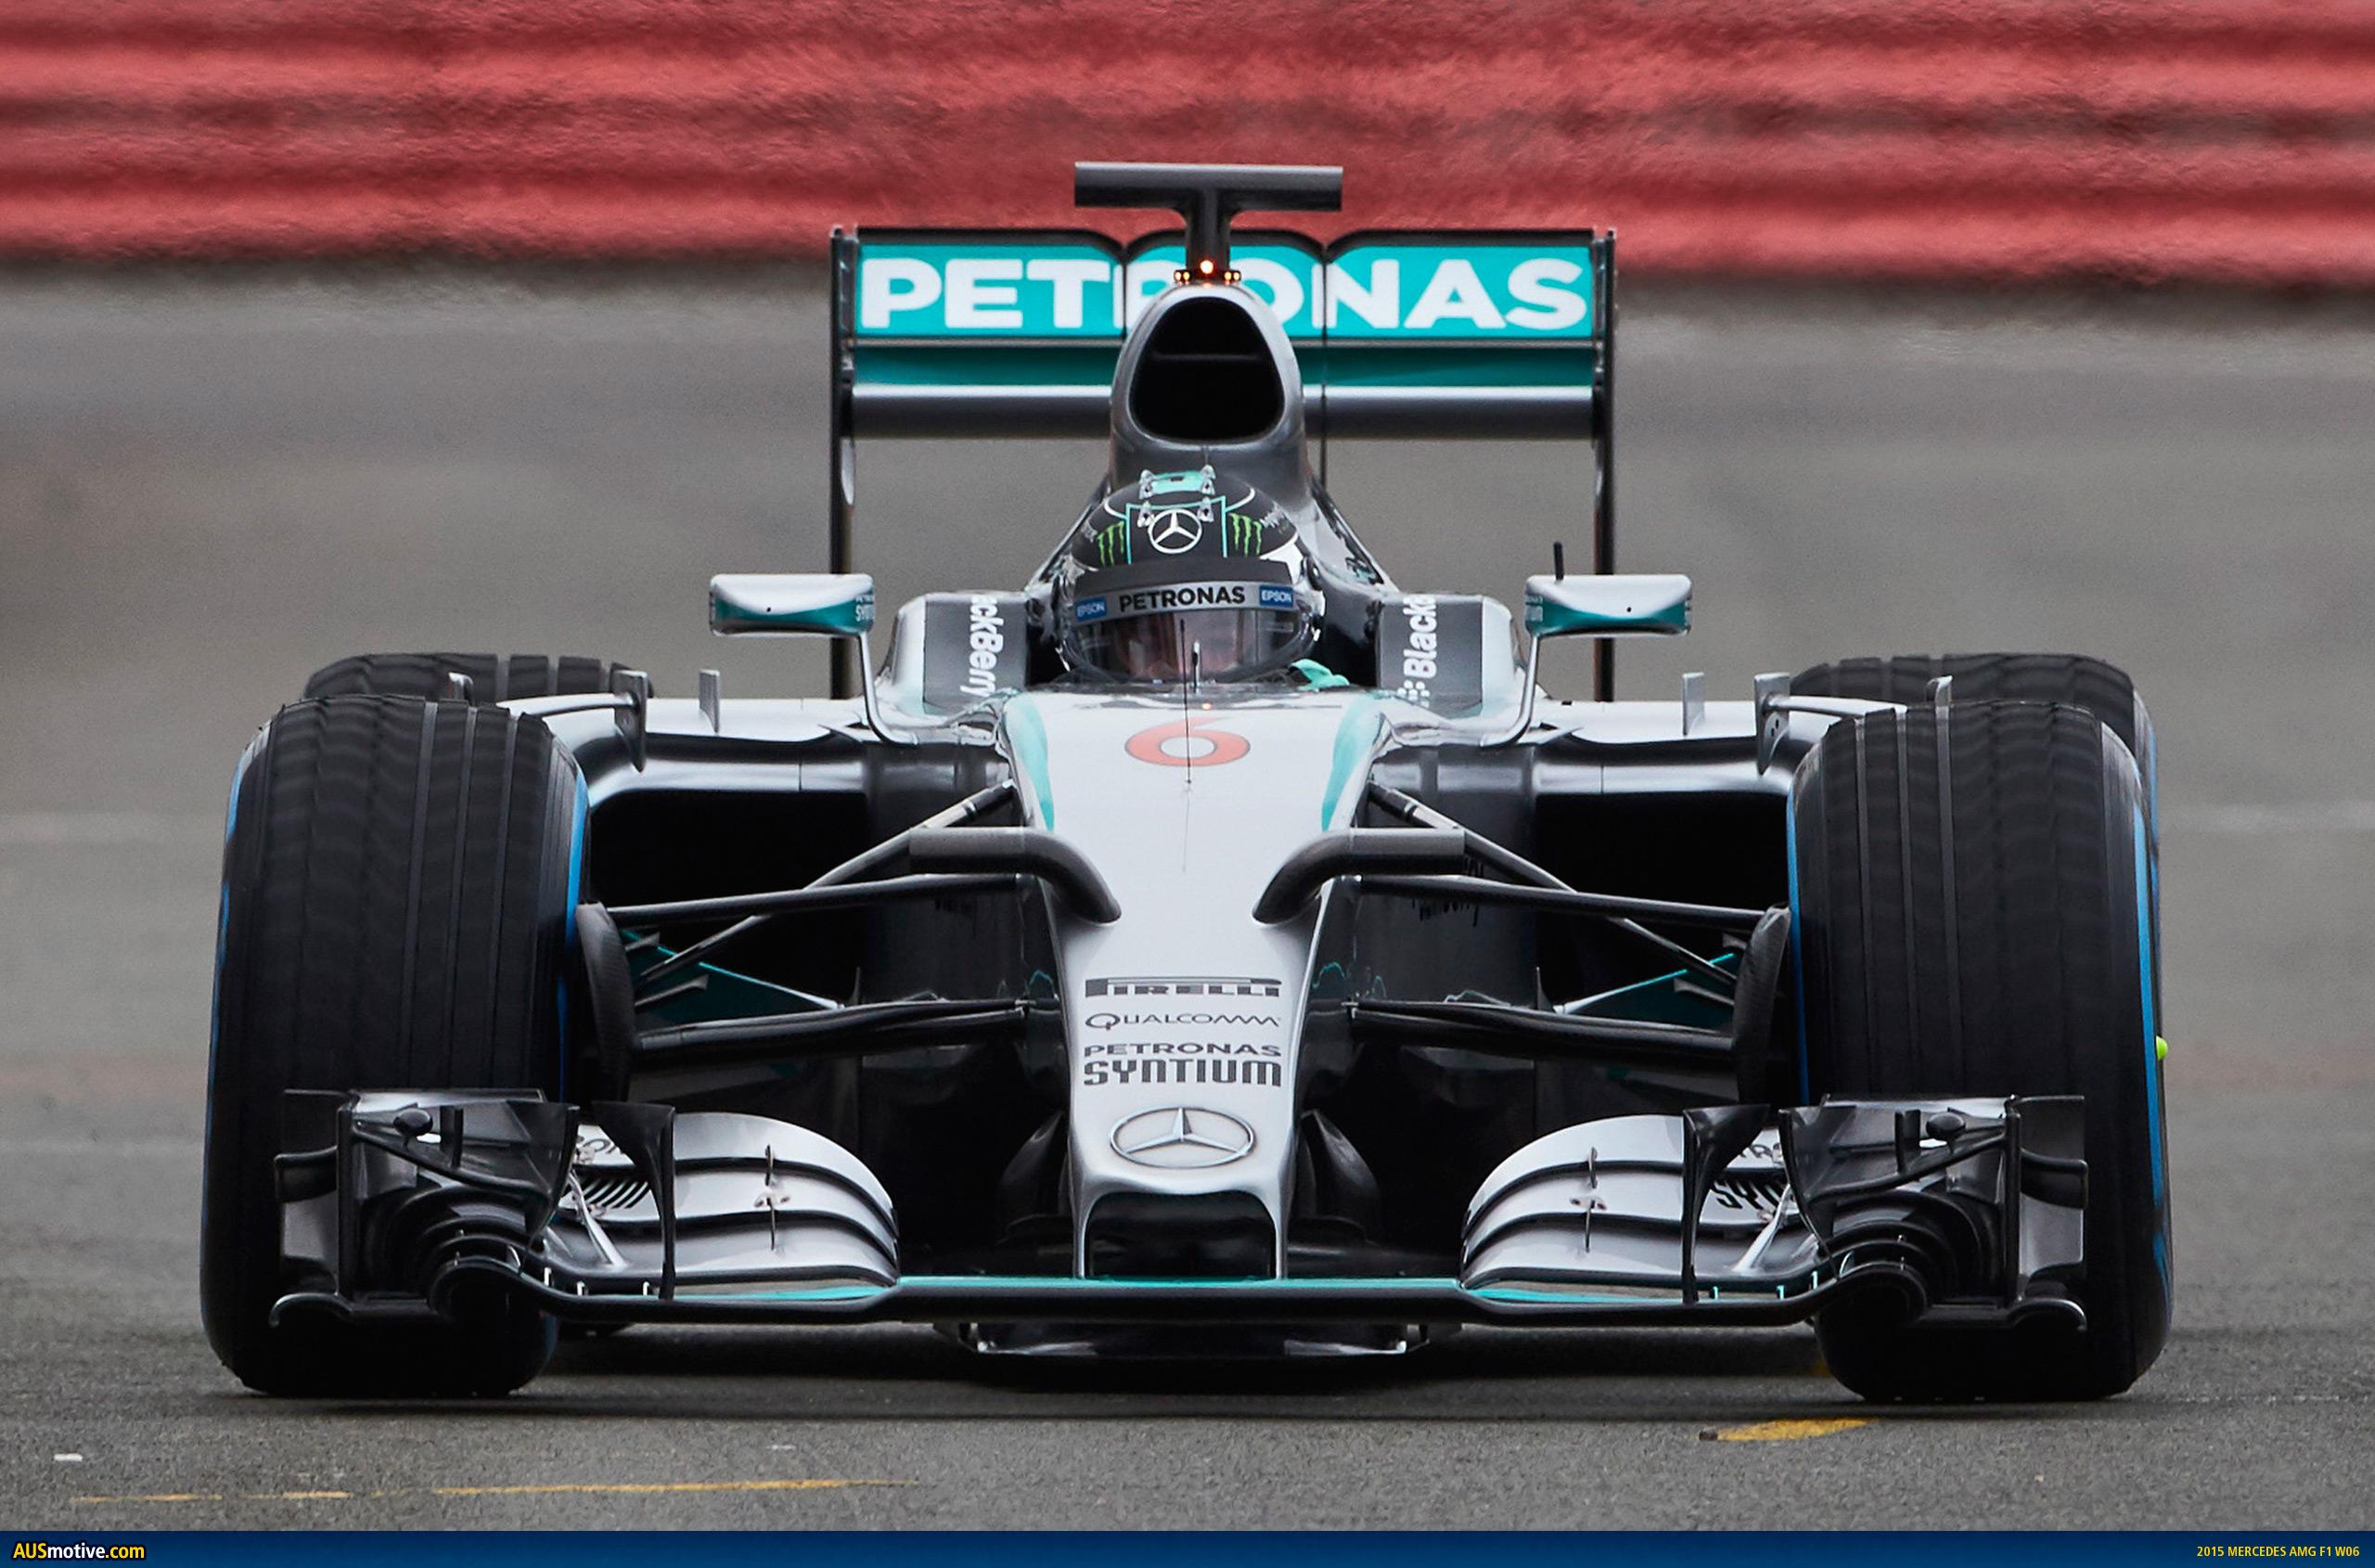 2015 Mercedes AMG F1 W06 Revealed